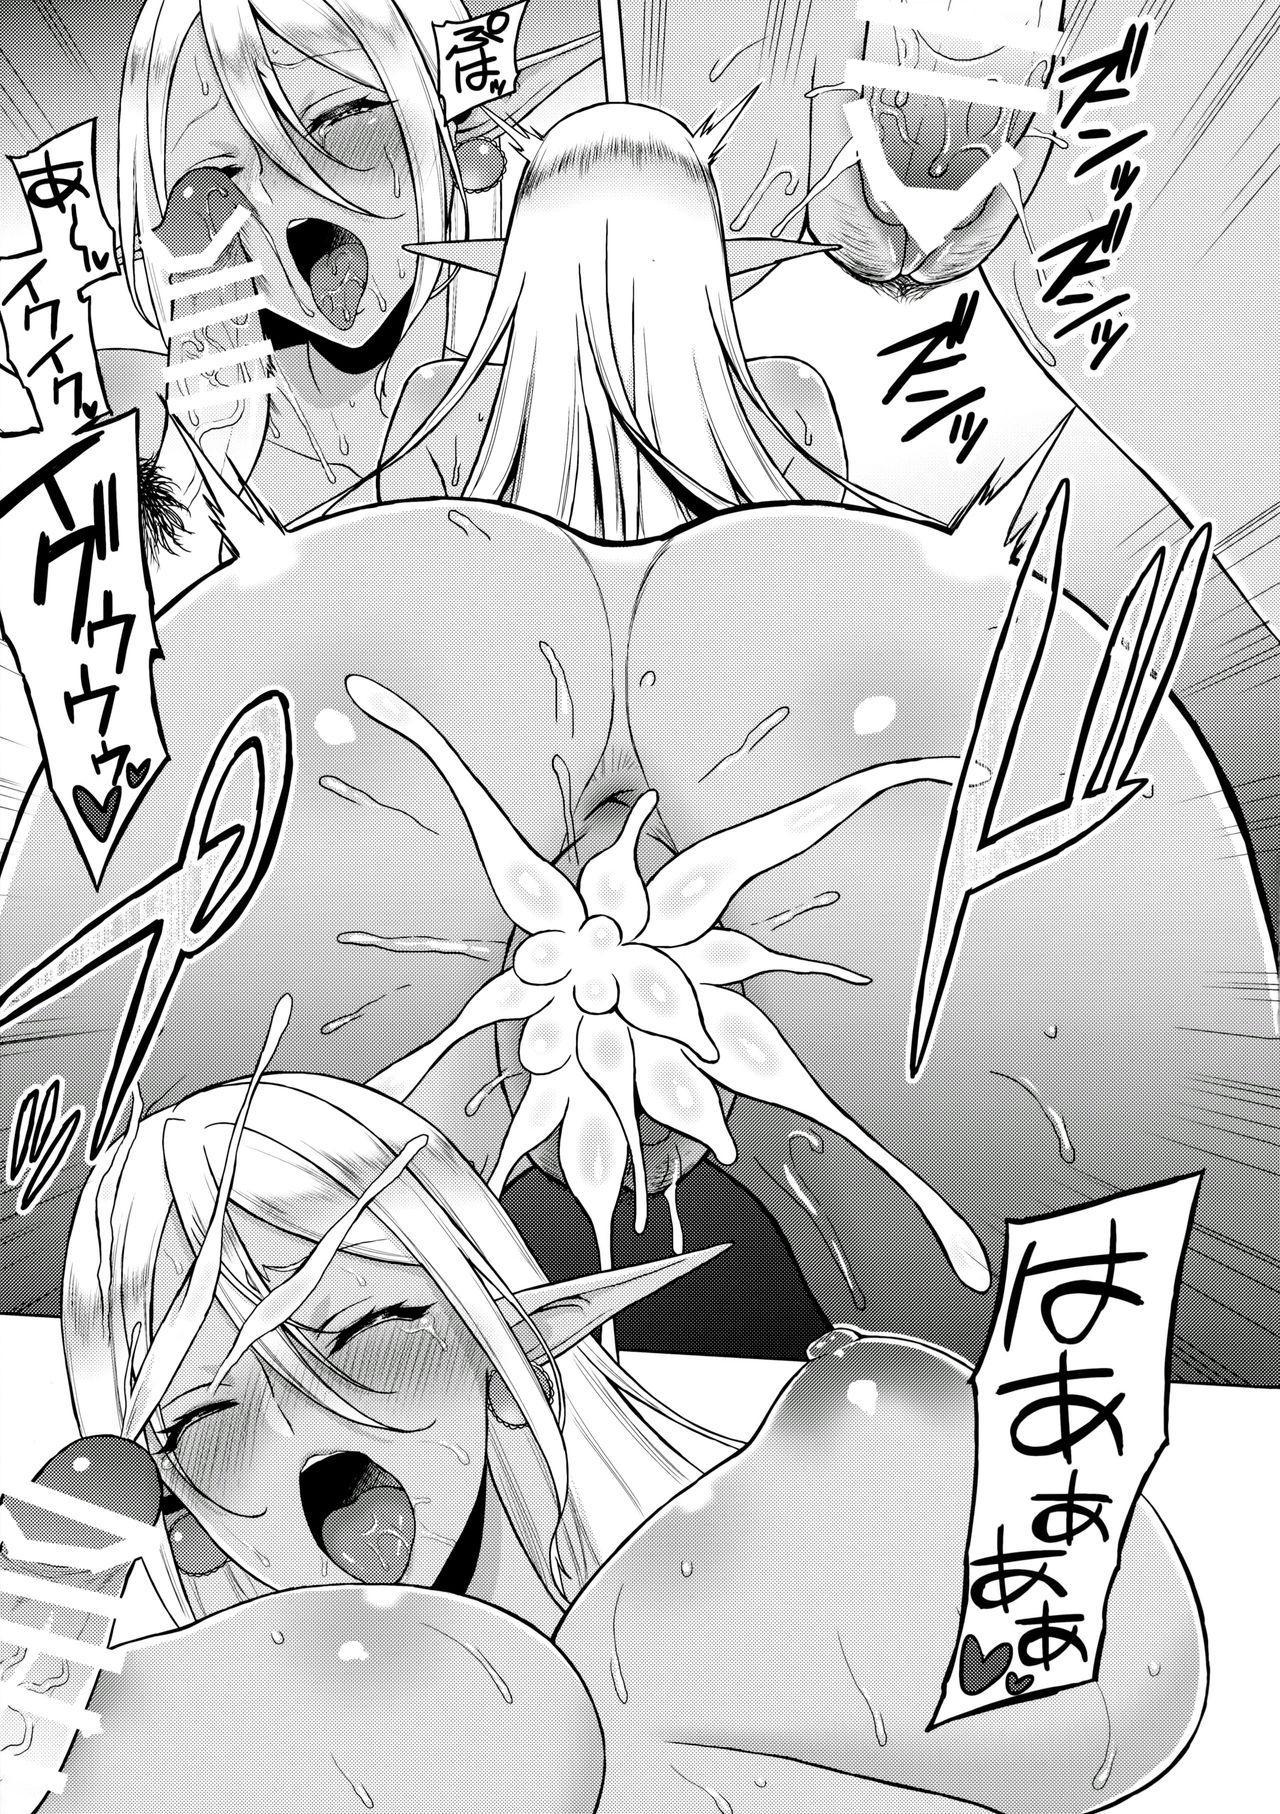 (C90) [H.B.A (Usagi Nagomu)] Inka -Nikuyoku ni Aragaenai Karada- + C90 Kaijou Genteibon 21